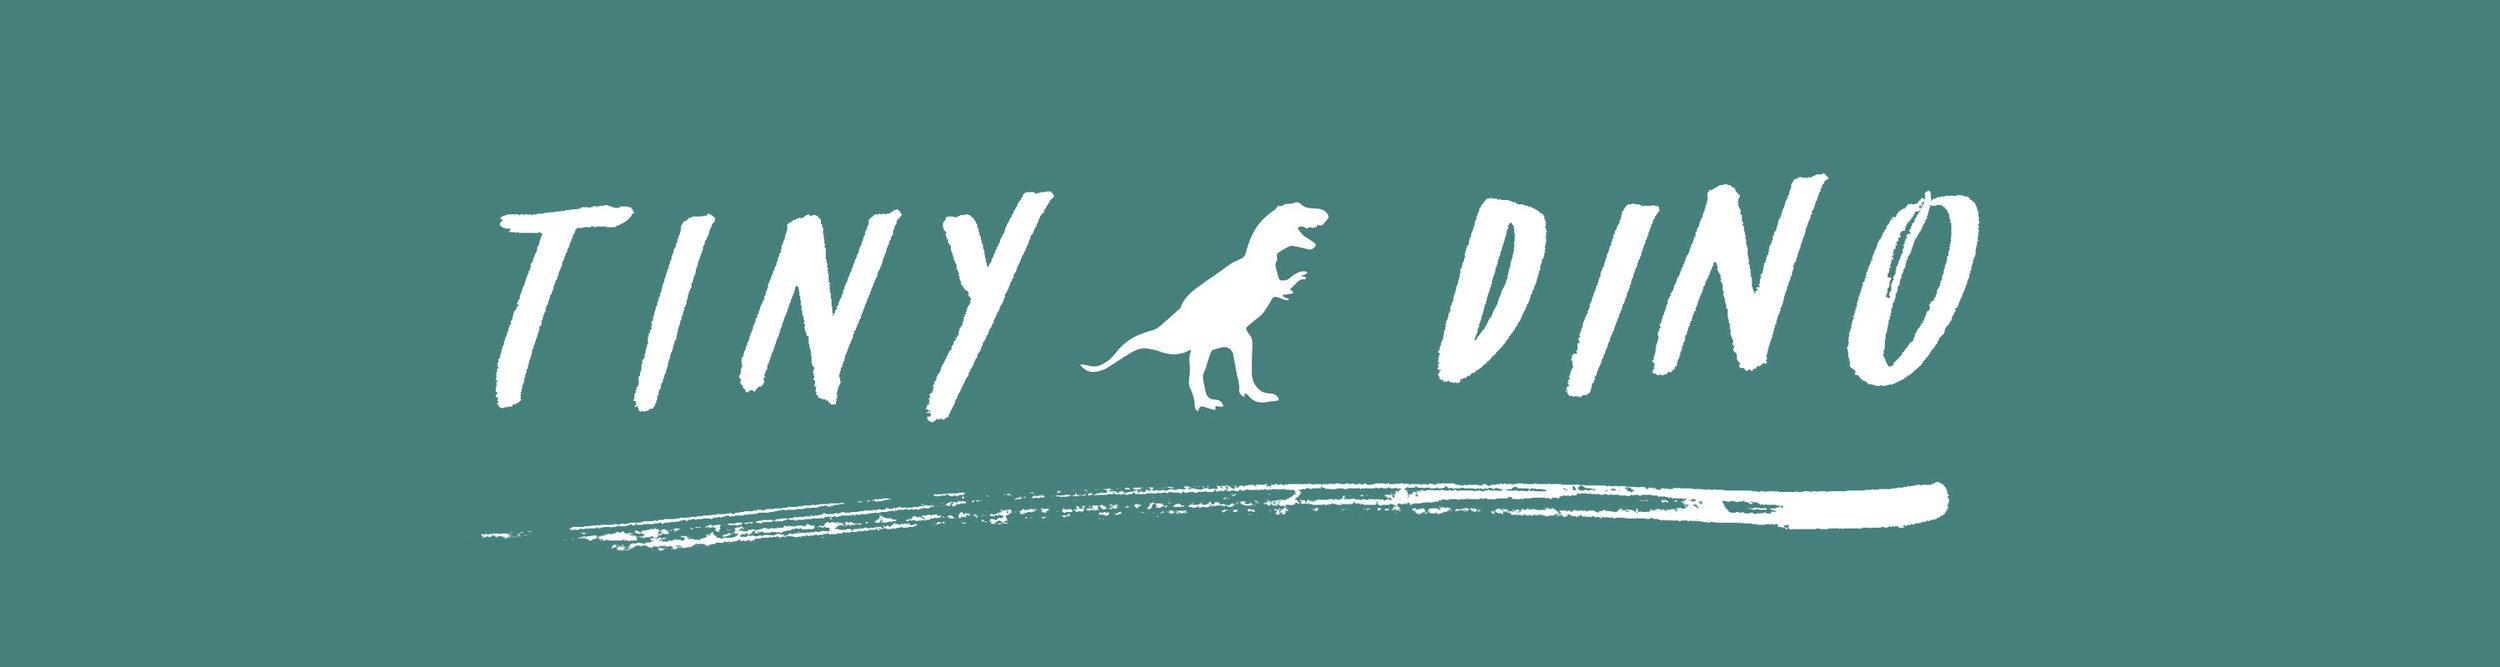 Tiny Dino Banner.jpg